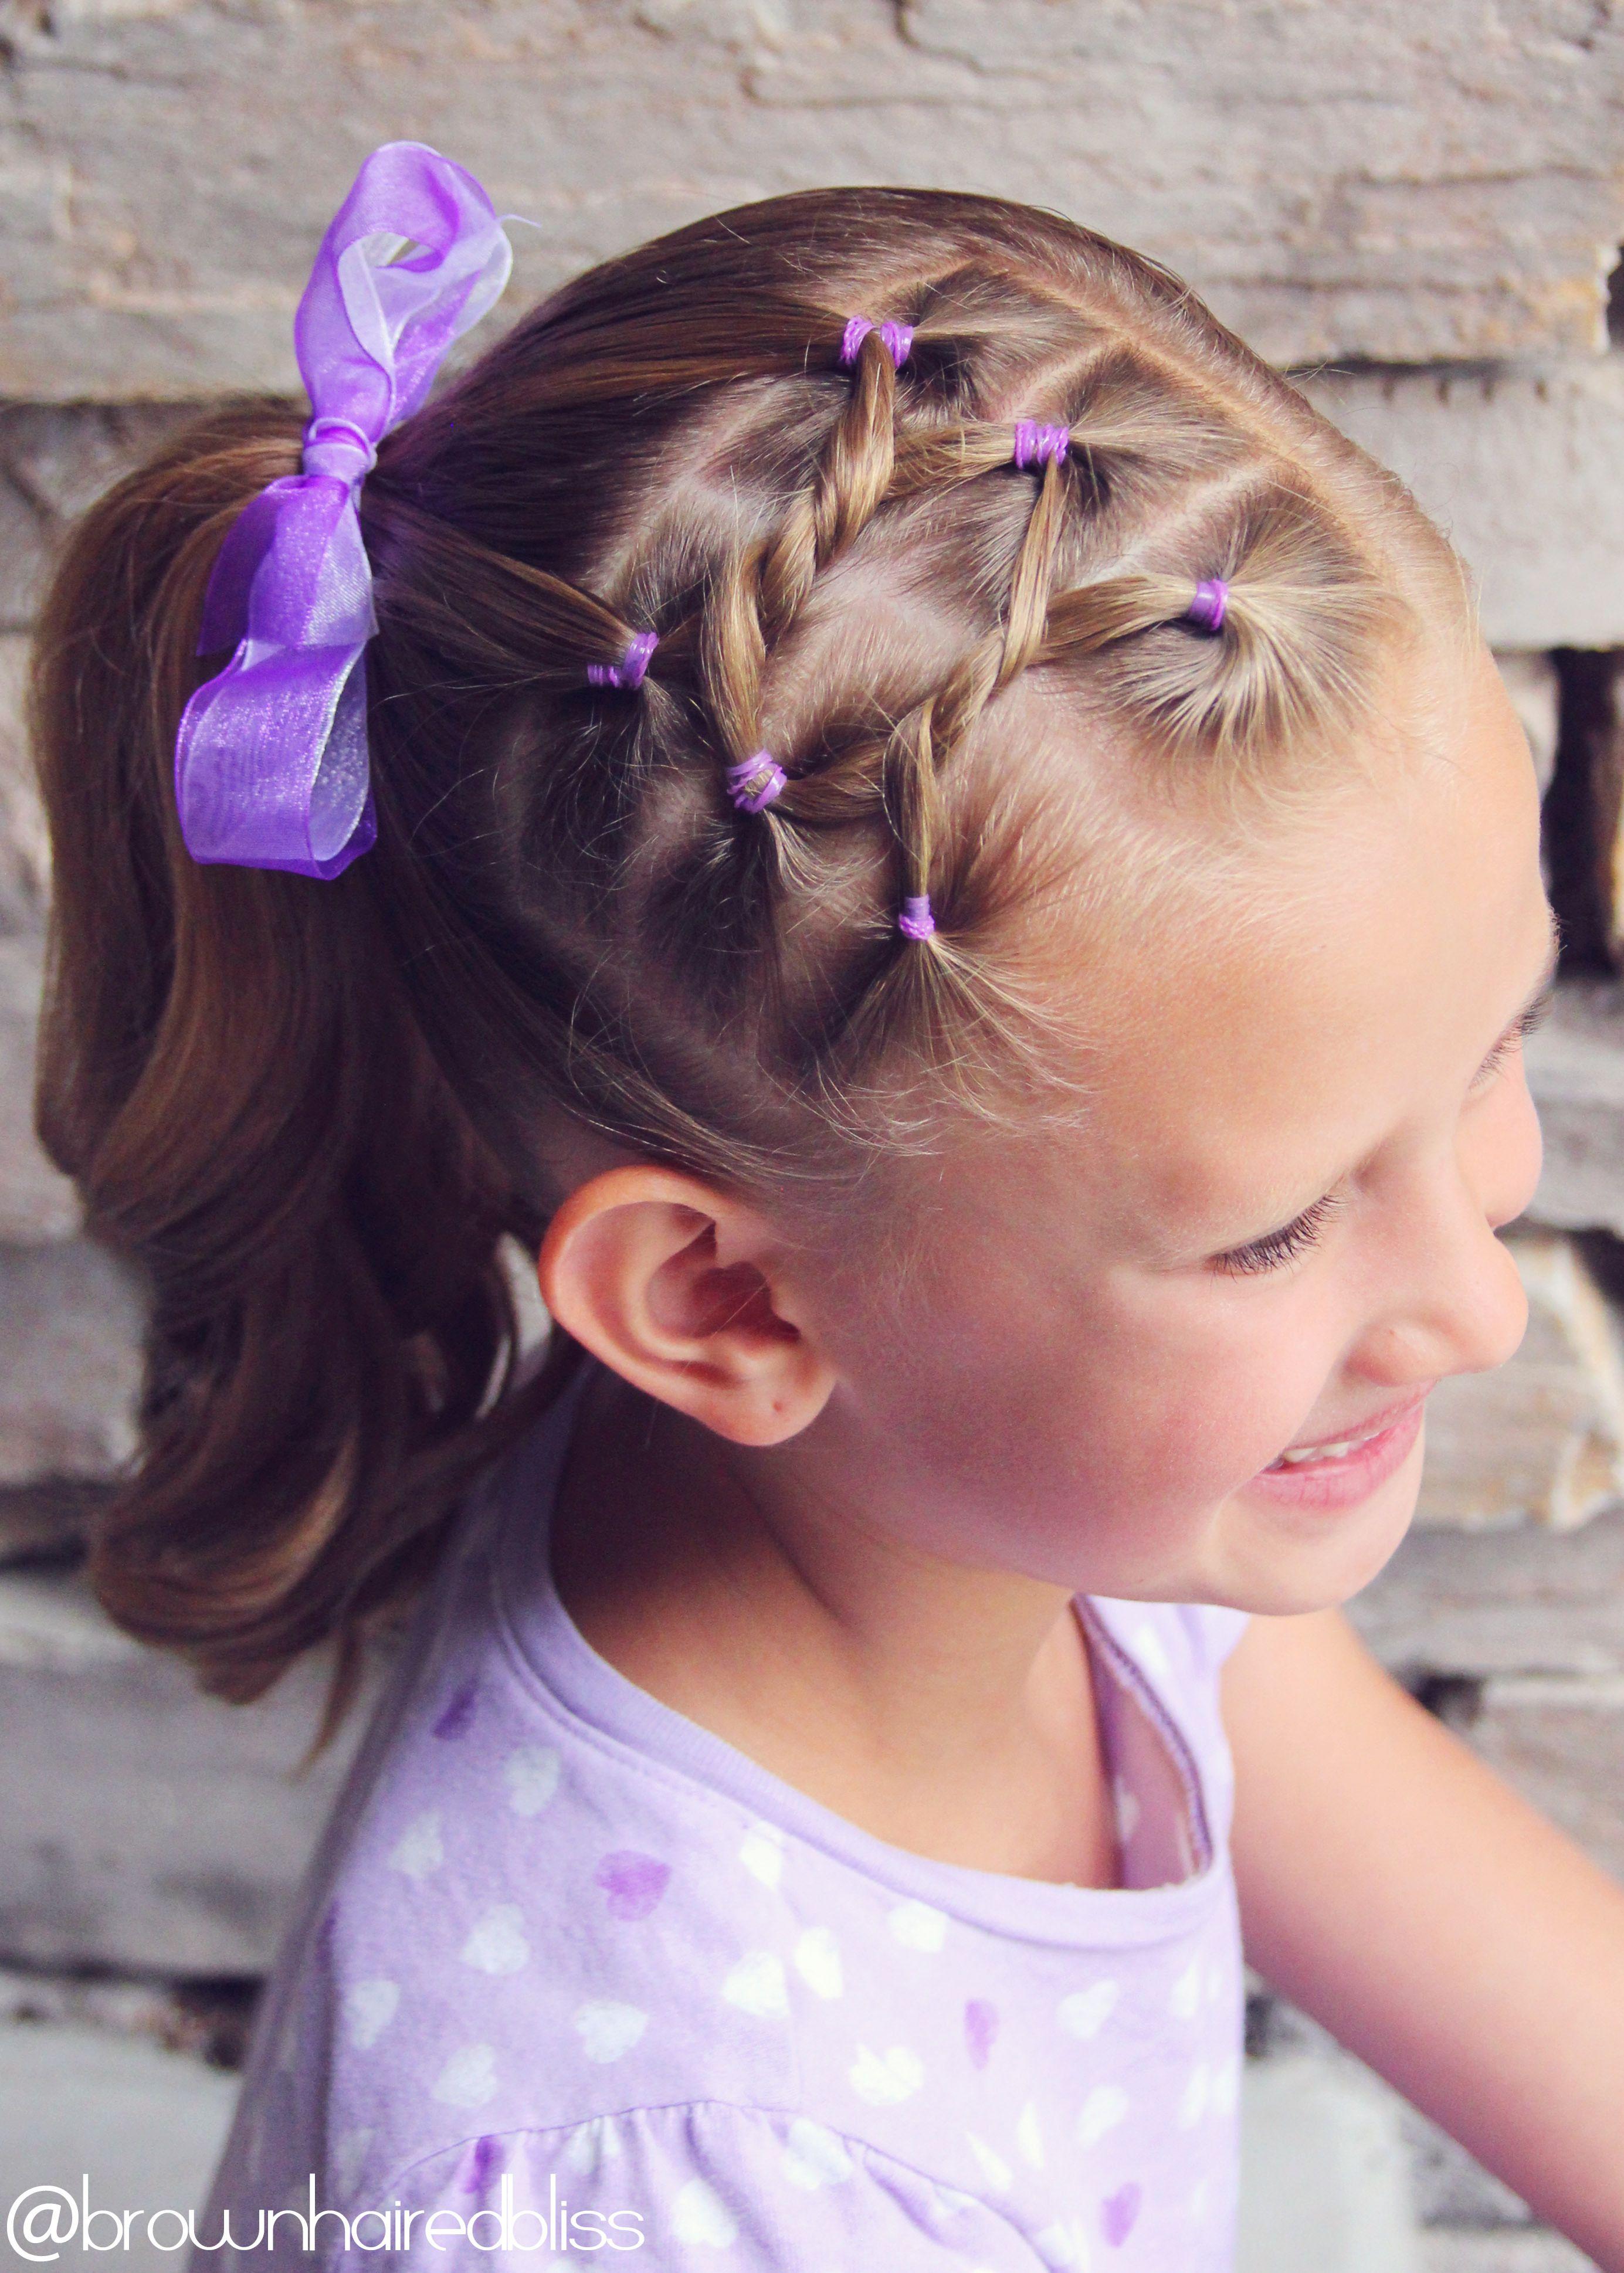 kids pinterest hair style girl hair and girl hairstyles